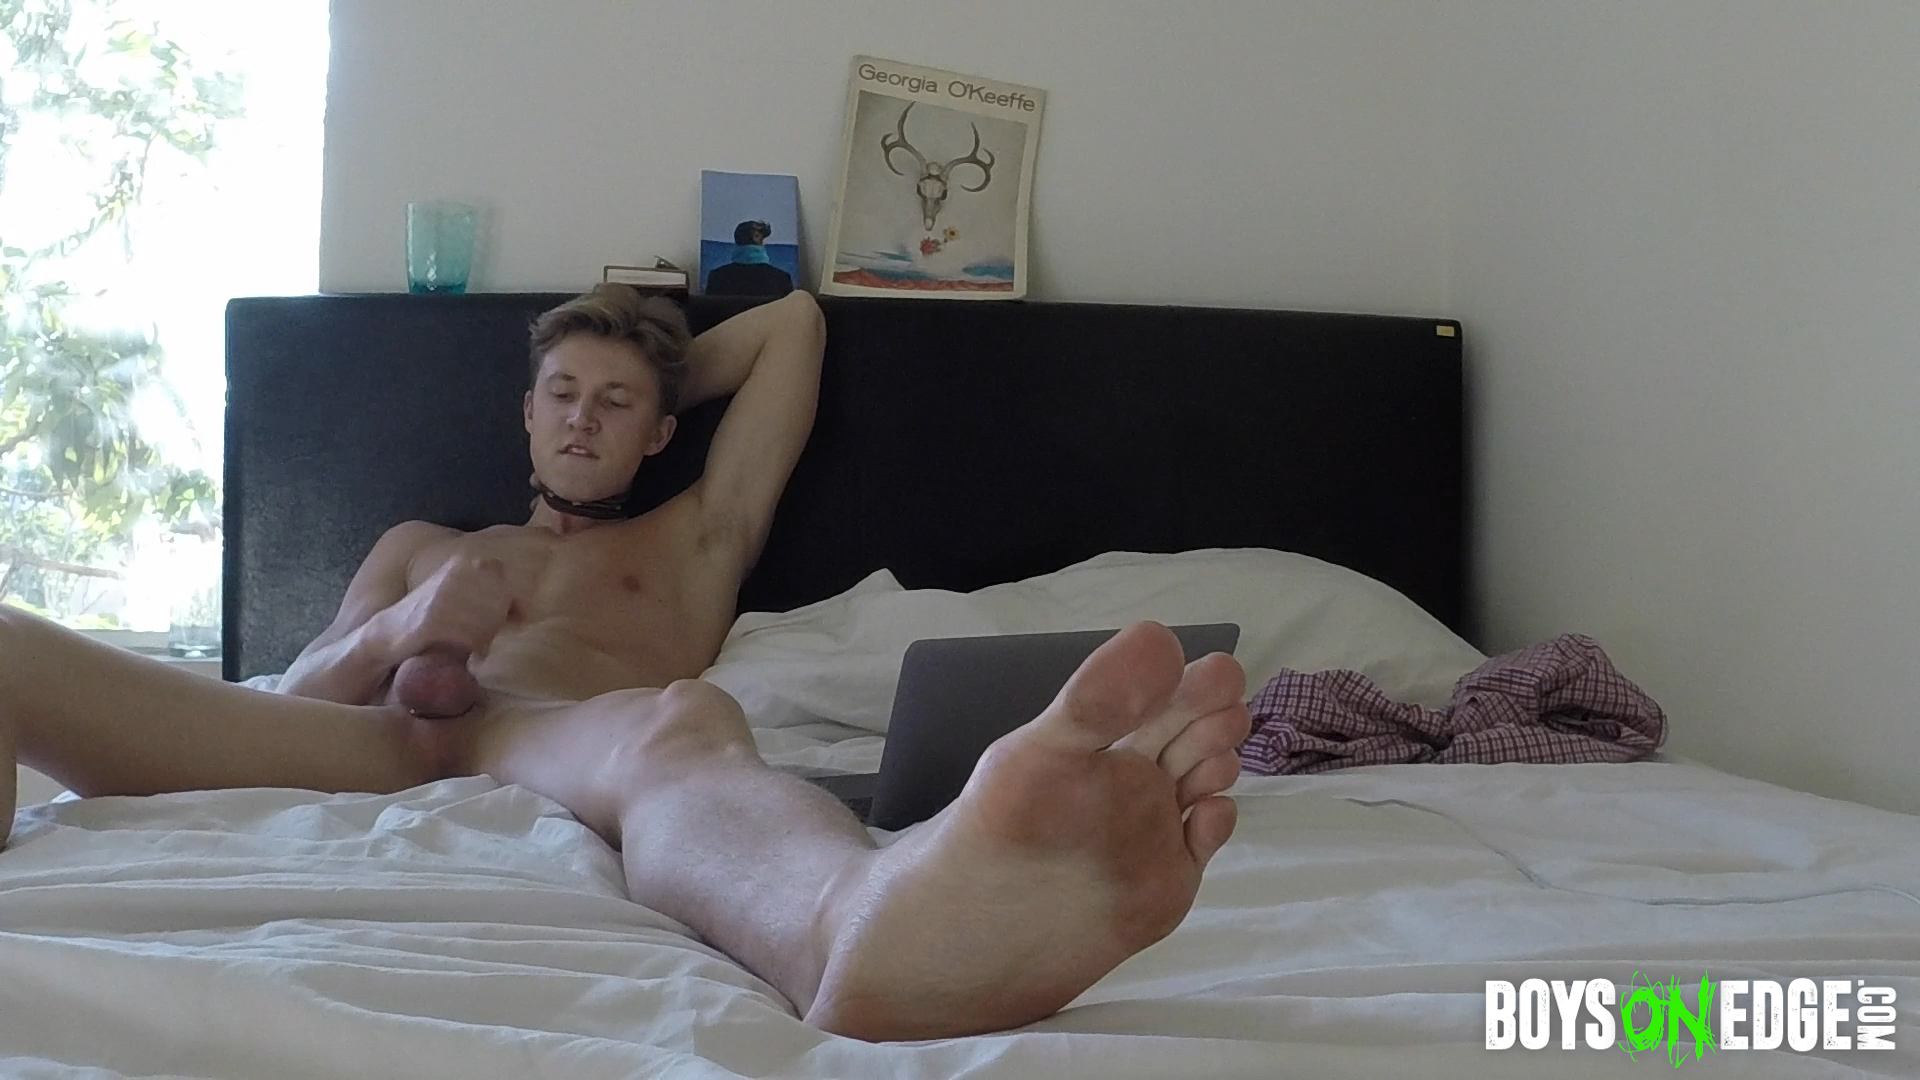 Auto erotic asphyxia video